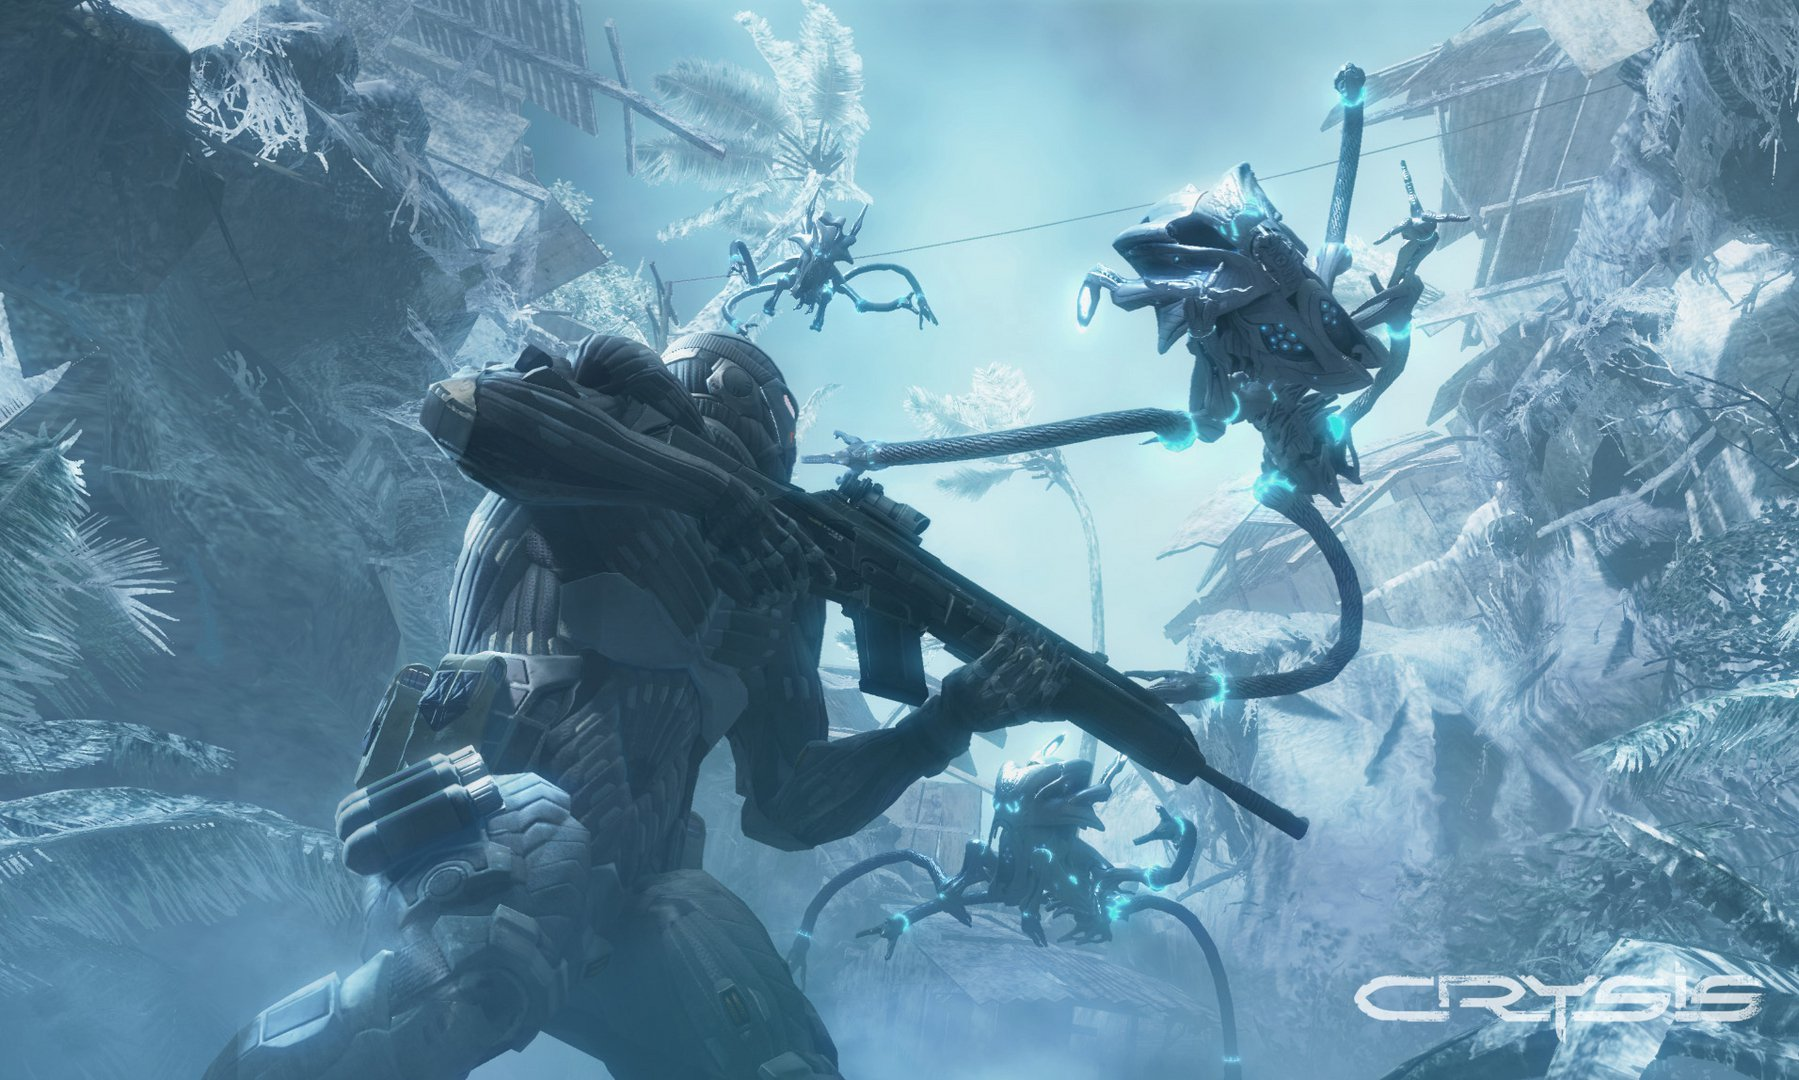 Crysis Maximum Edition 2